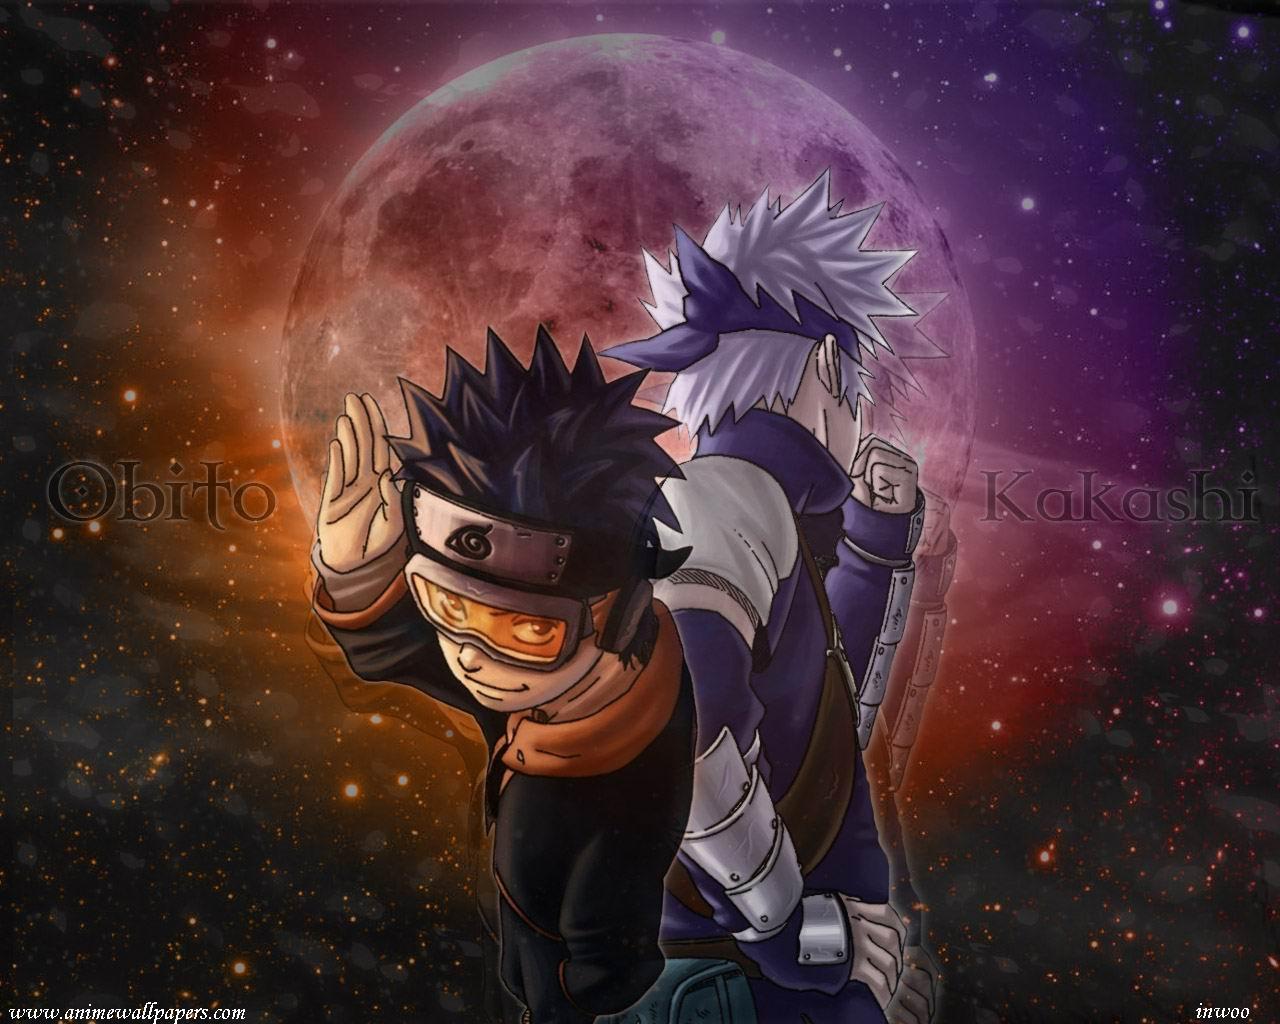 Naruto Shisui Wallpapers Top Free Naruto Shisui Backgrounds Wallpaperaccess